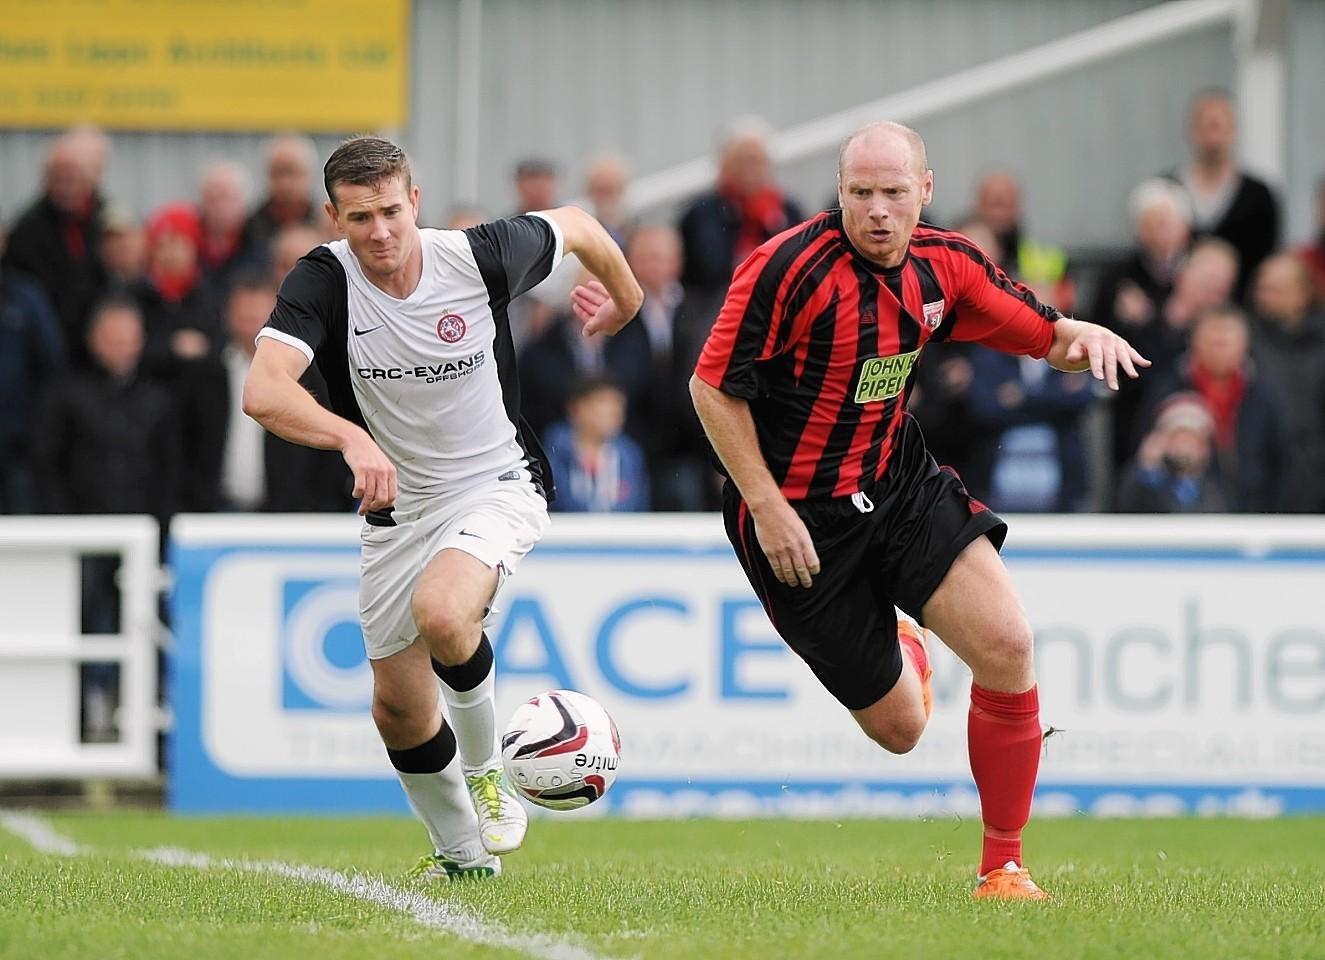 Locos striker Martin Bavidge